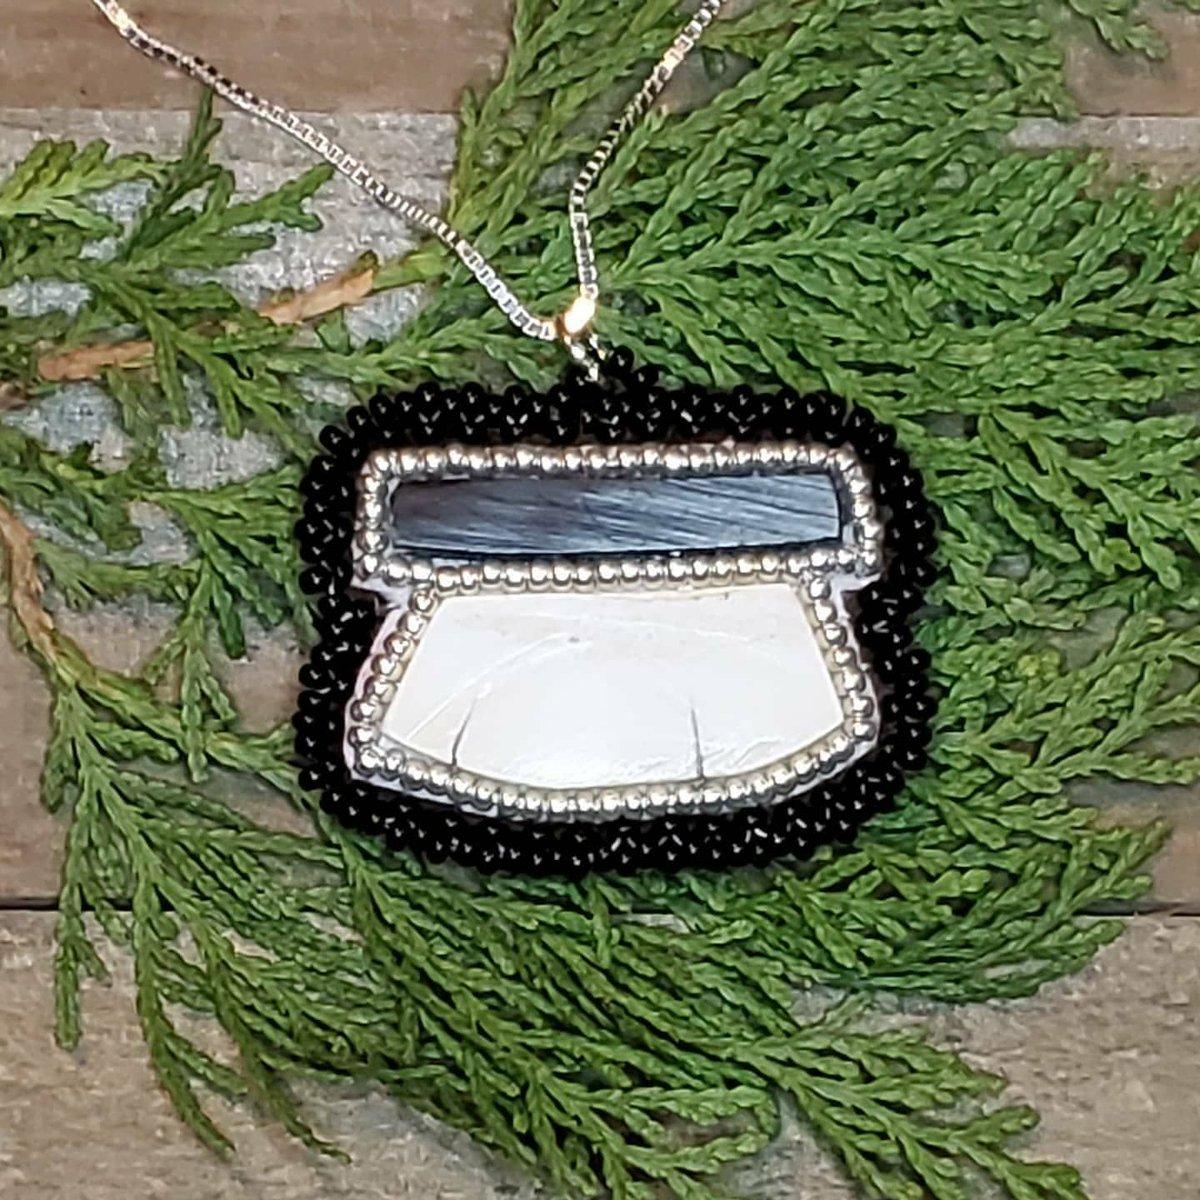 Baleen & walrus ivory ulu pendant with a .925 sterling silver chain, available on my IG lovealaskabeads.  #NativeTwitter #beadwork #AlaskaNative #FirstNations #NativeMade #BuyNative #Statimc #Unangax #Aleut #ivory #baleen